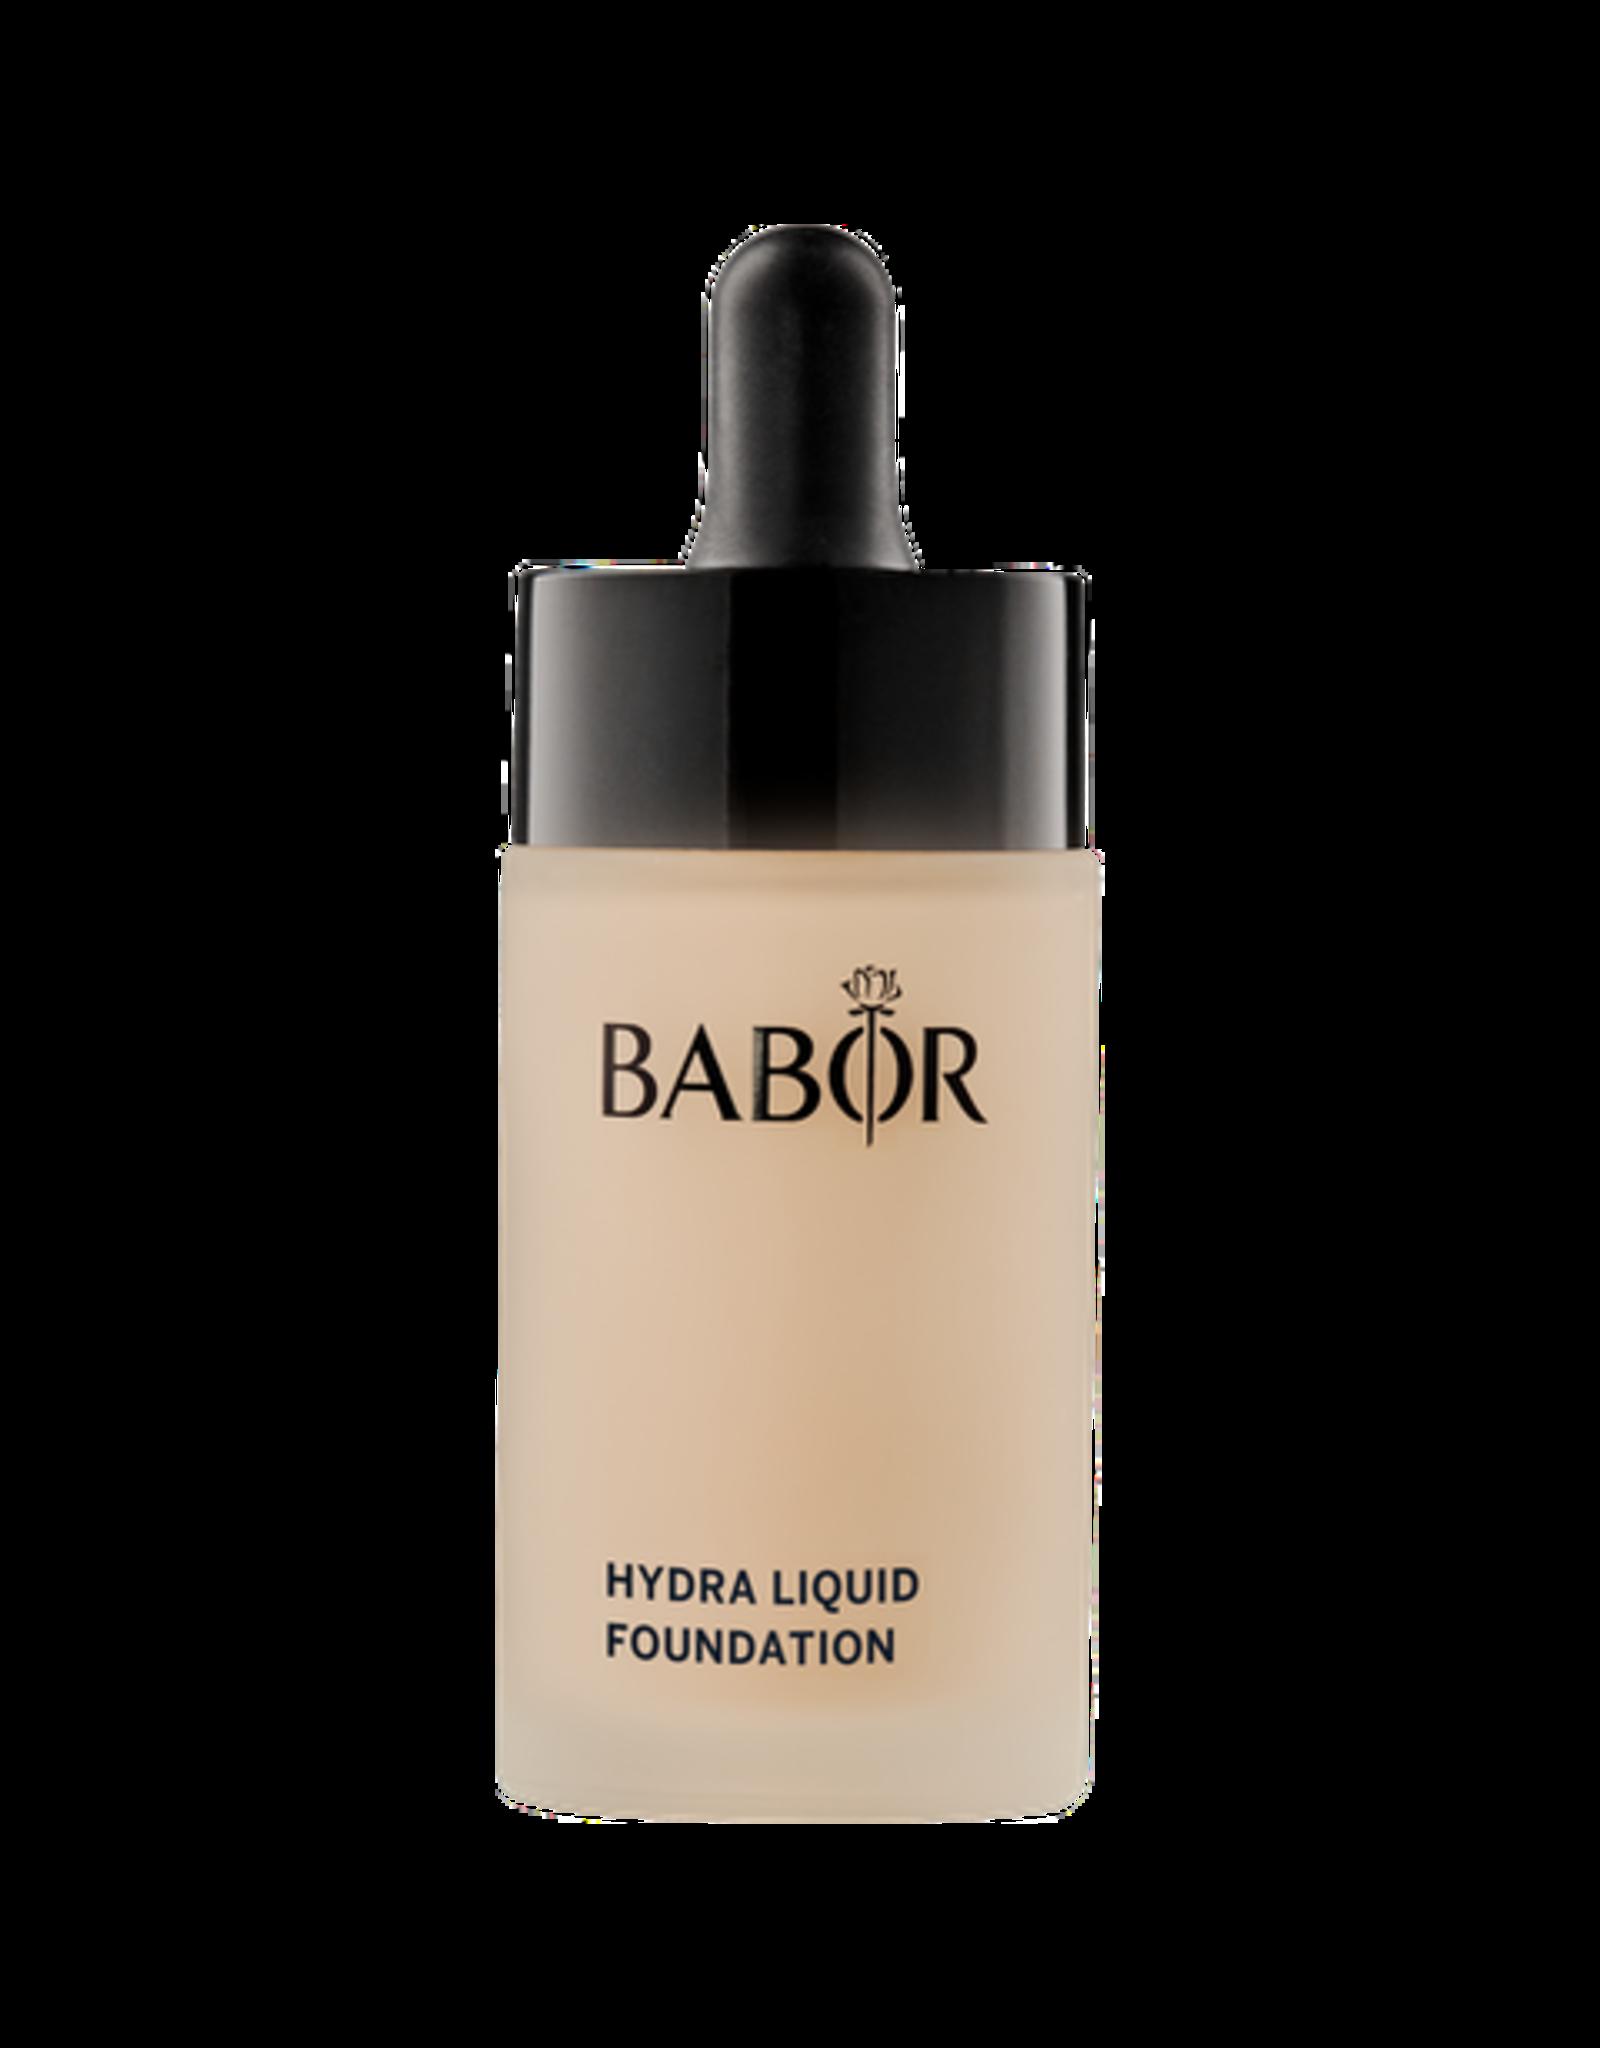 BABOR HYDRA LIQUID FOUNDATION 08 SUNNY